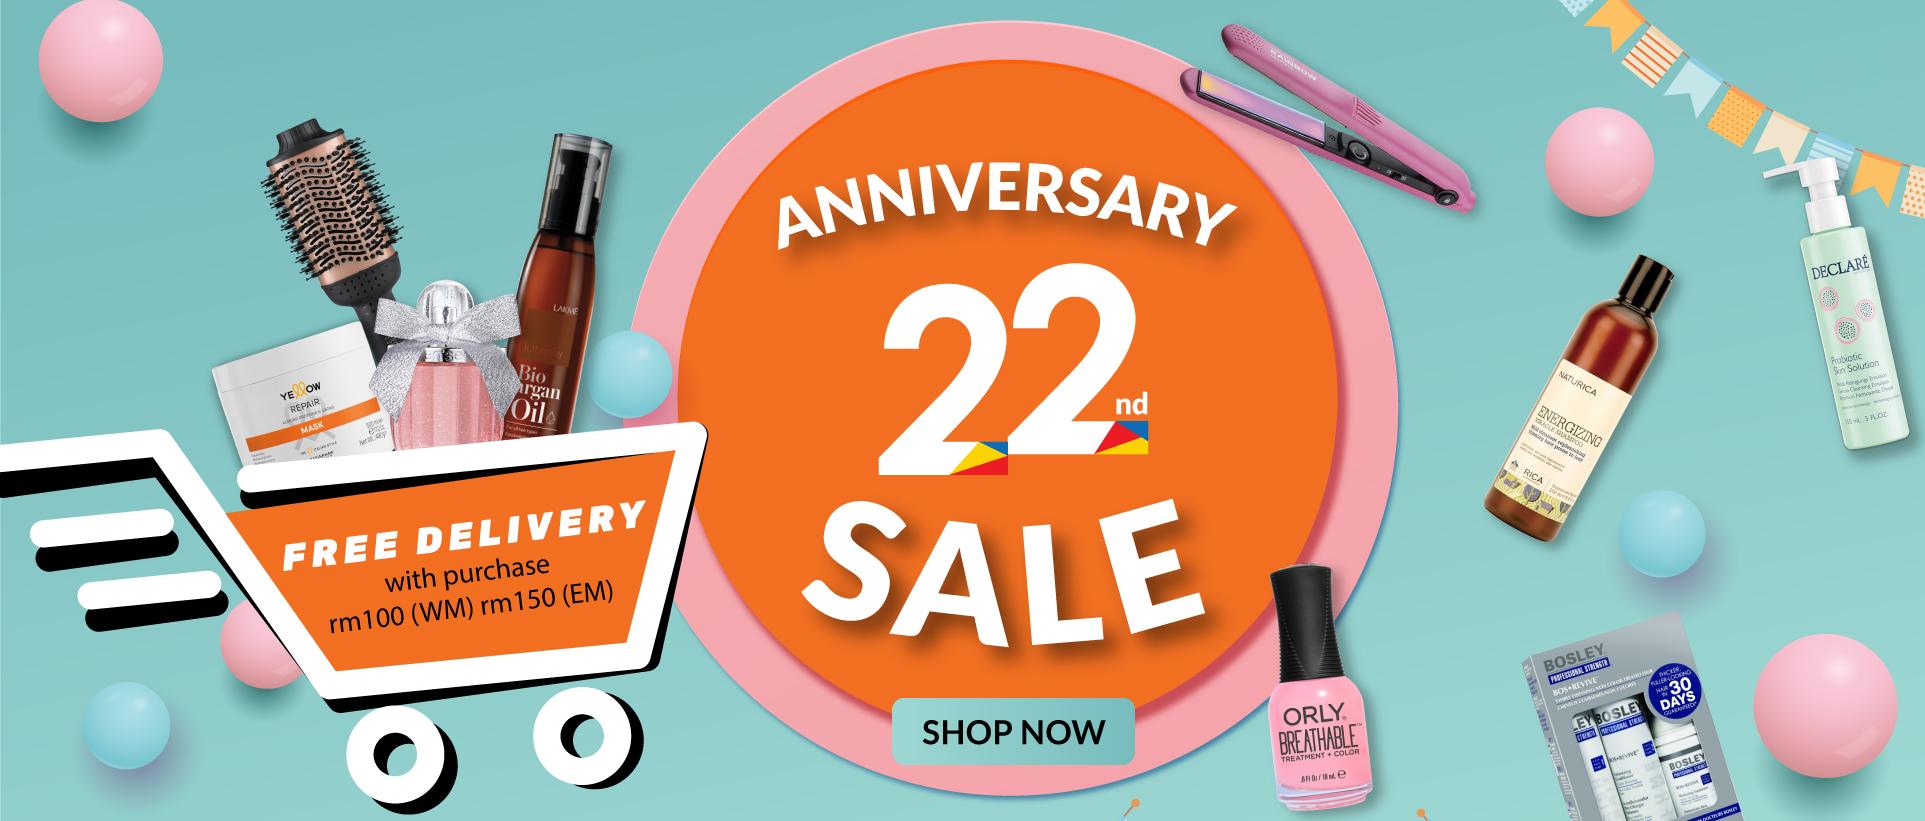 Shins Anniversary 22